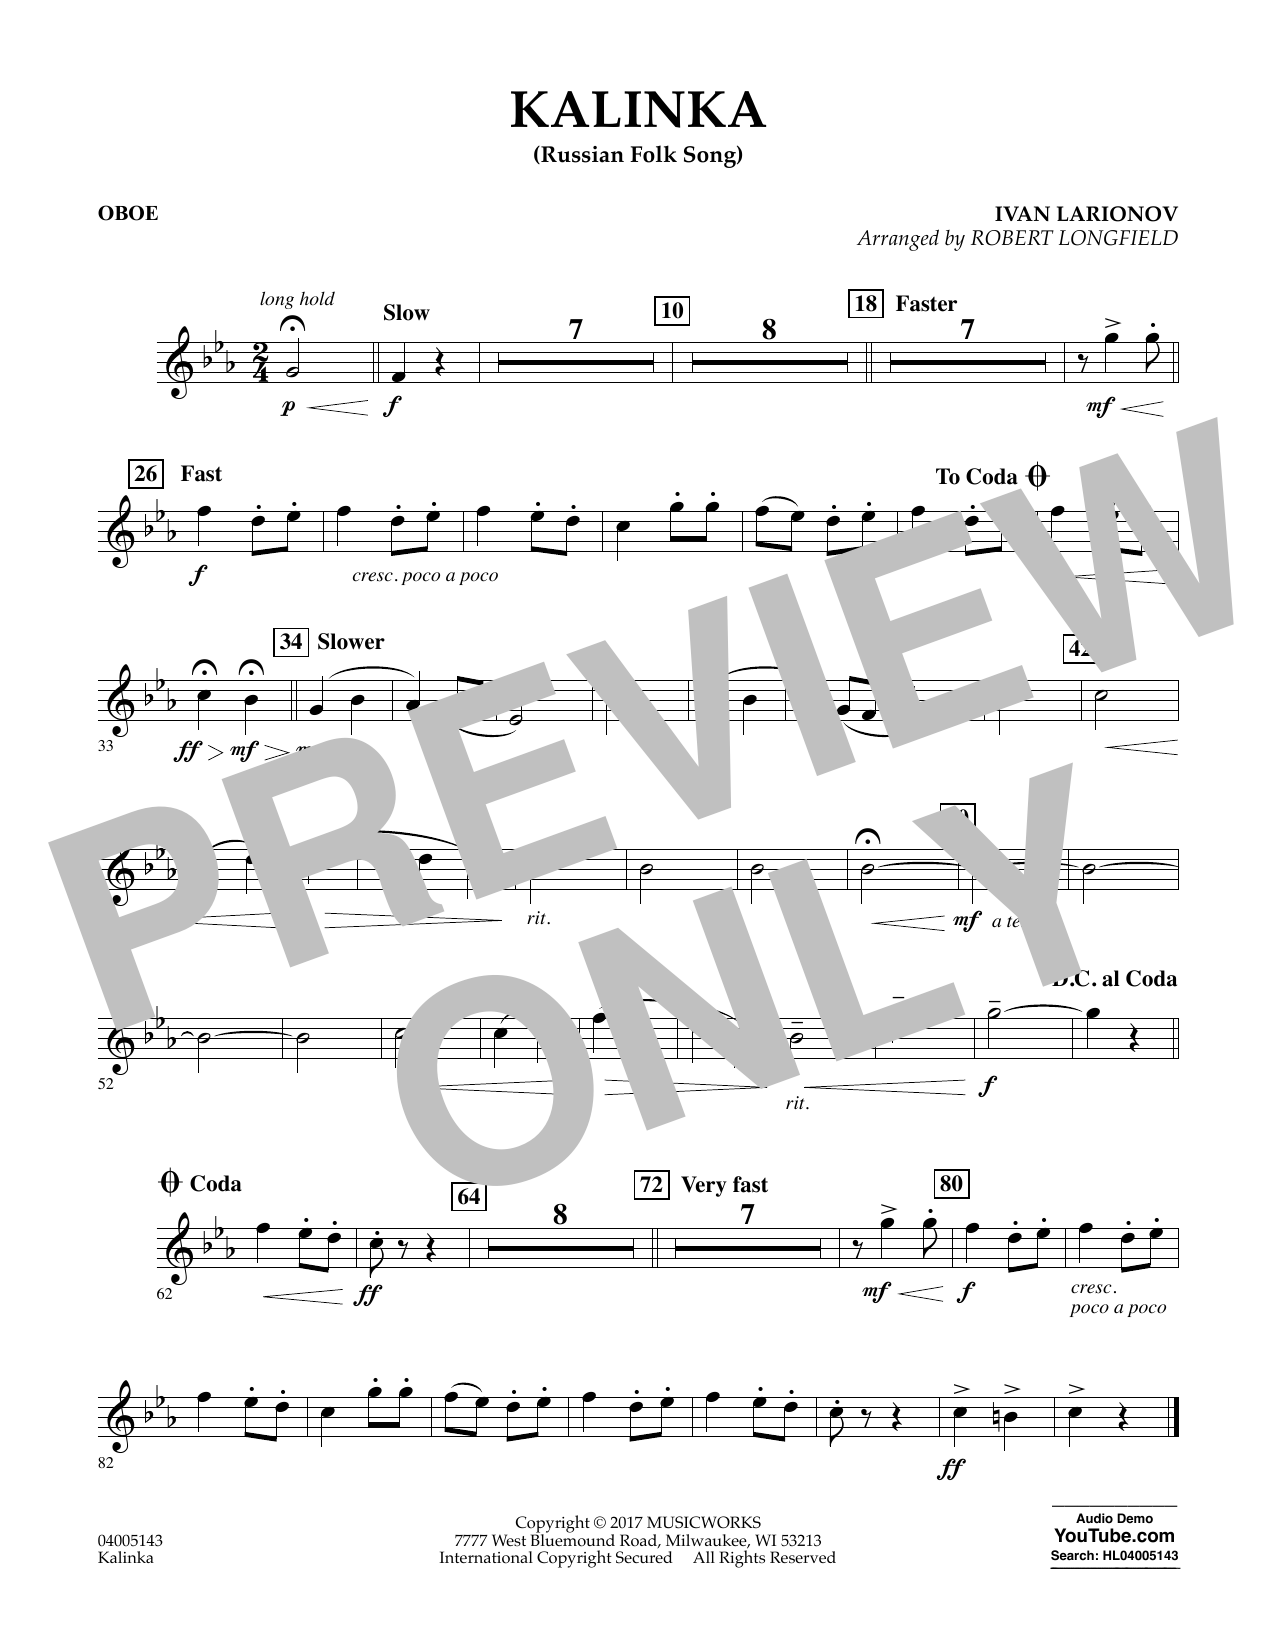 Robert Longfield Kalinka (Russian Folk Song) - Oboe sheet music notes and chords. Download Printable PDF.